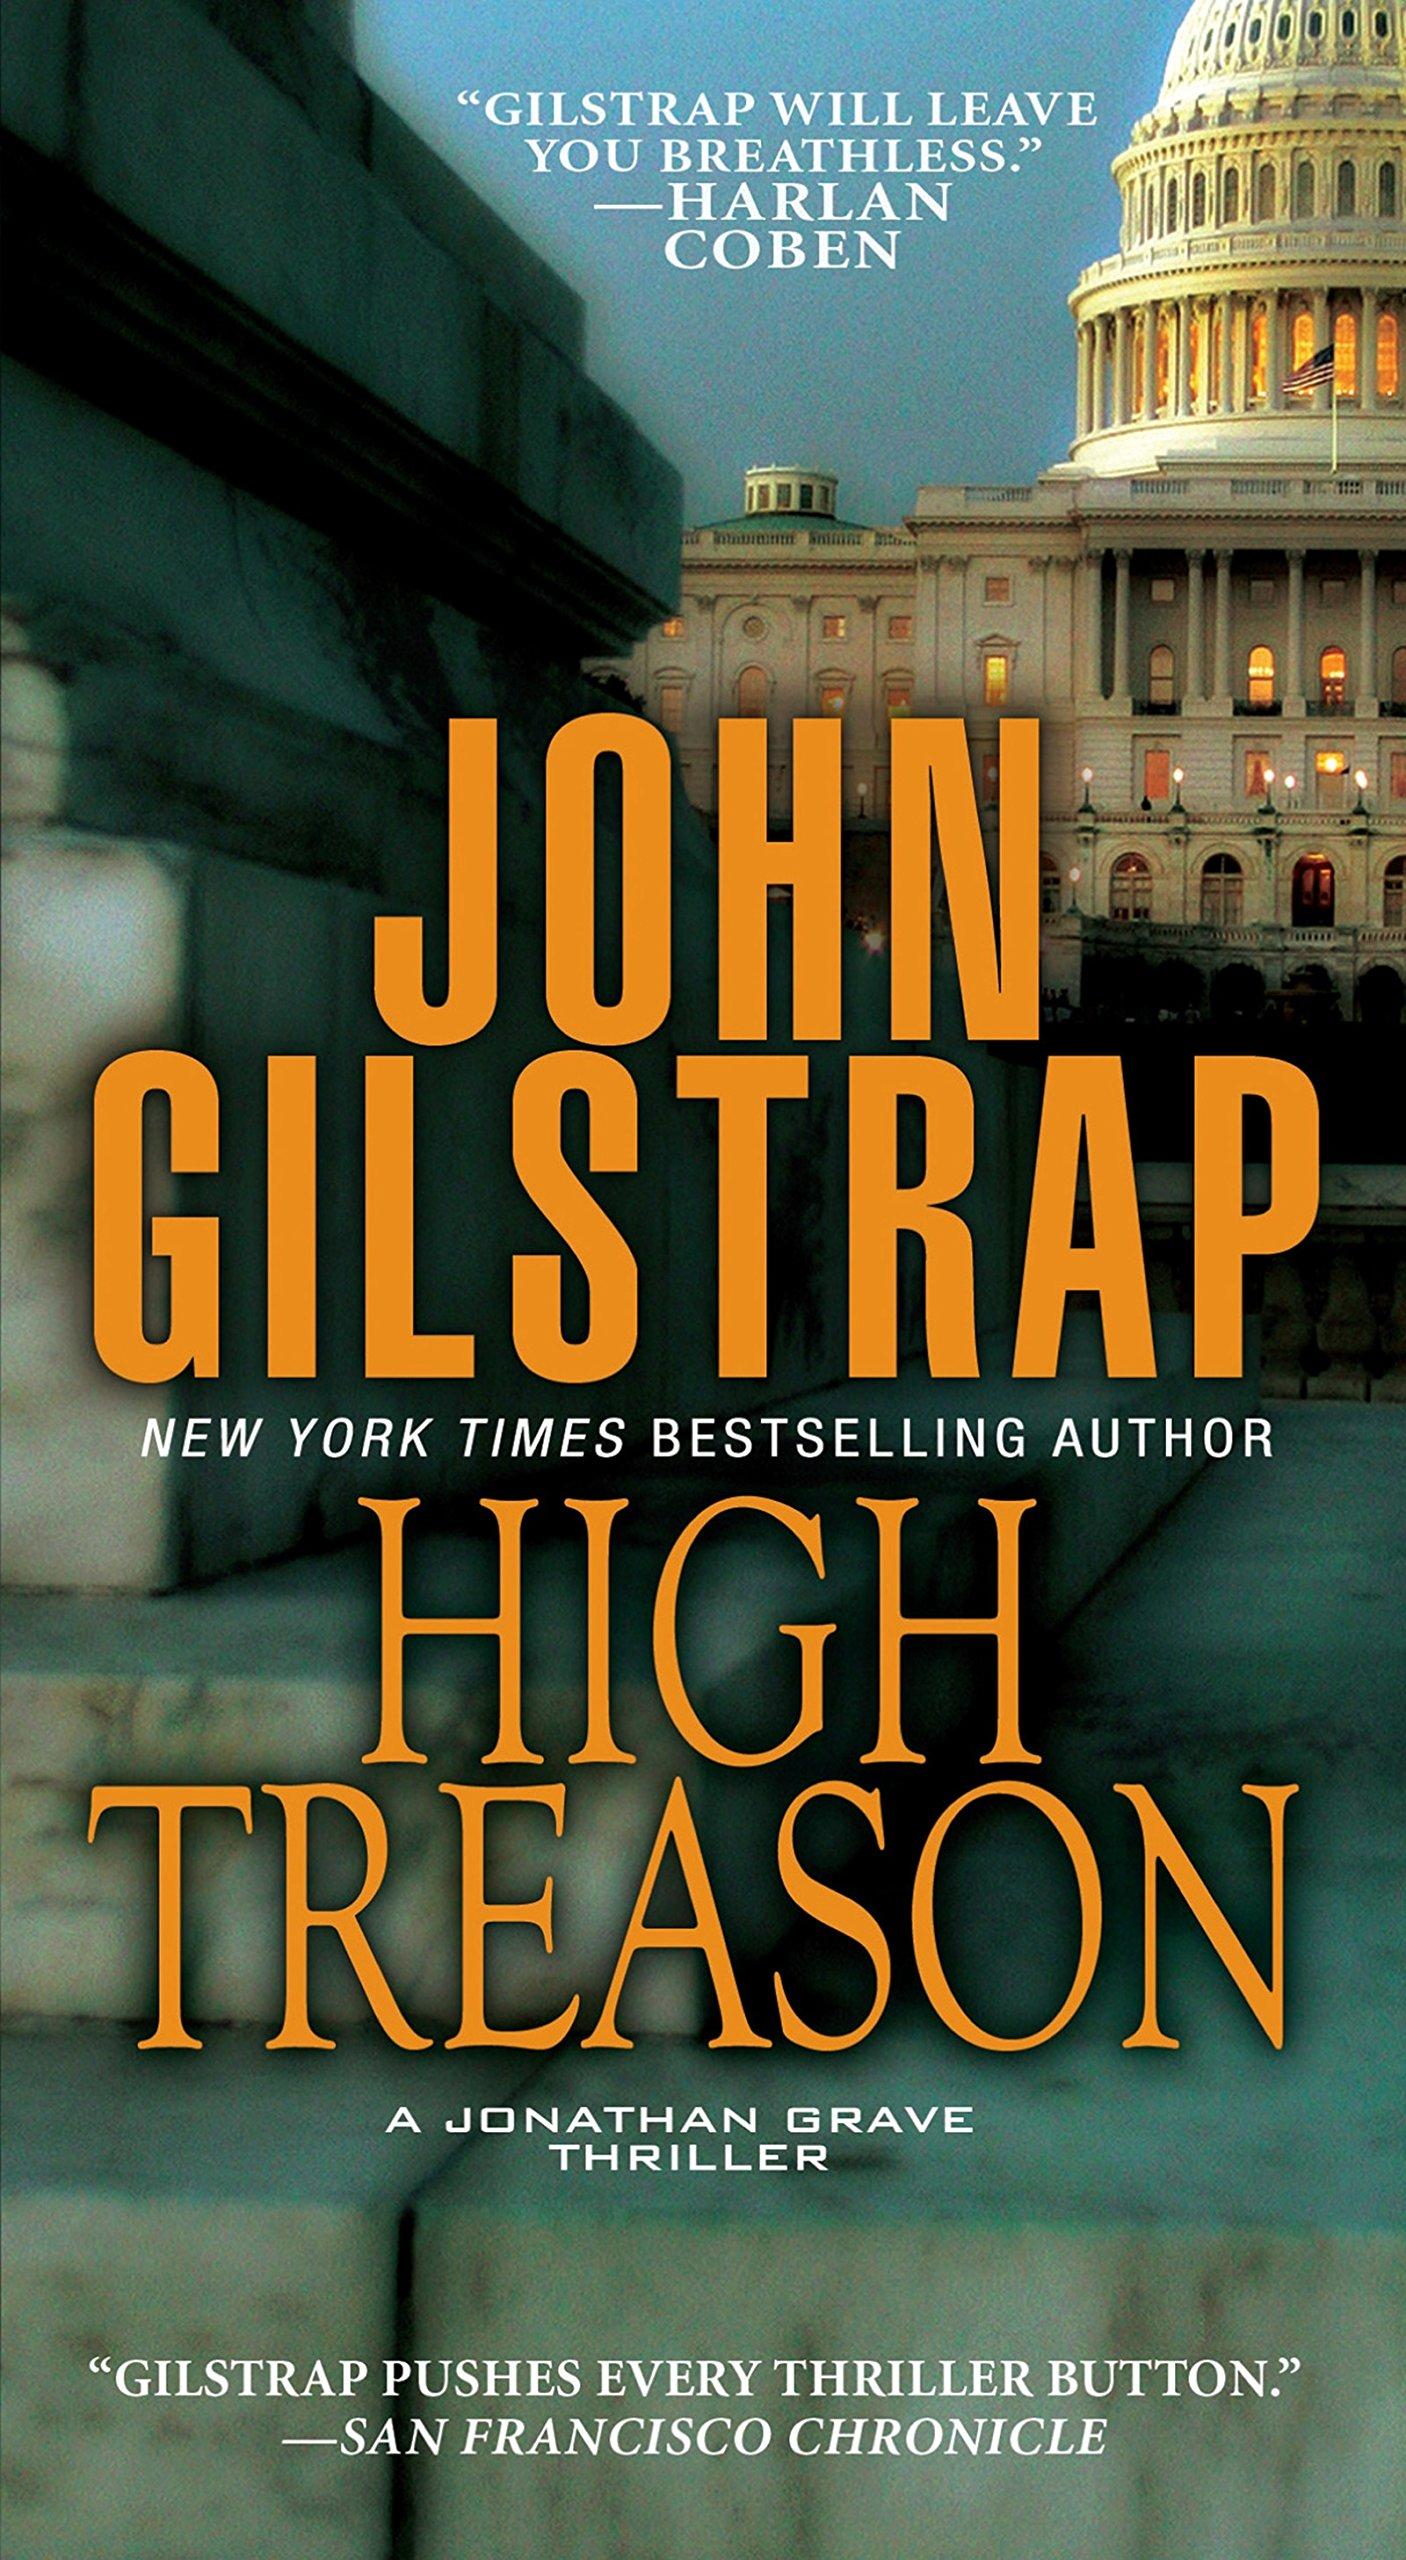 Amazon.com: High Treason (Jonathan Grave) (9780786030194): John Gilstrap:  Books